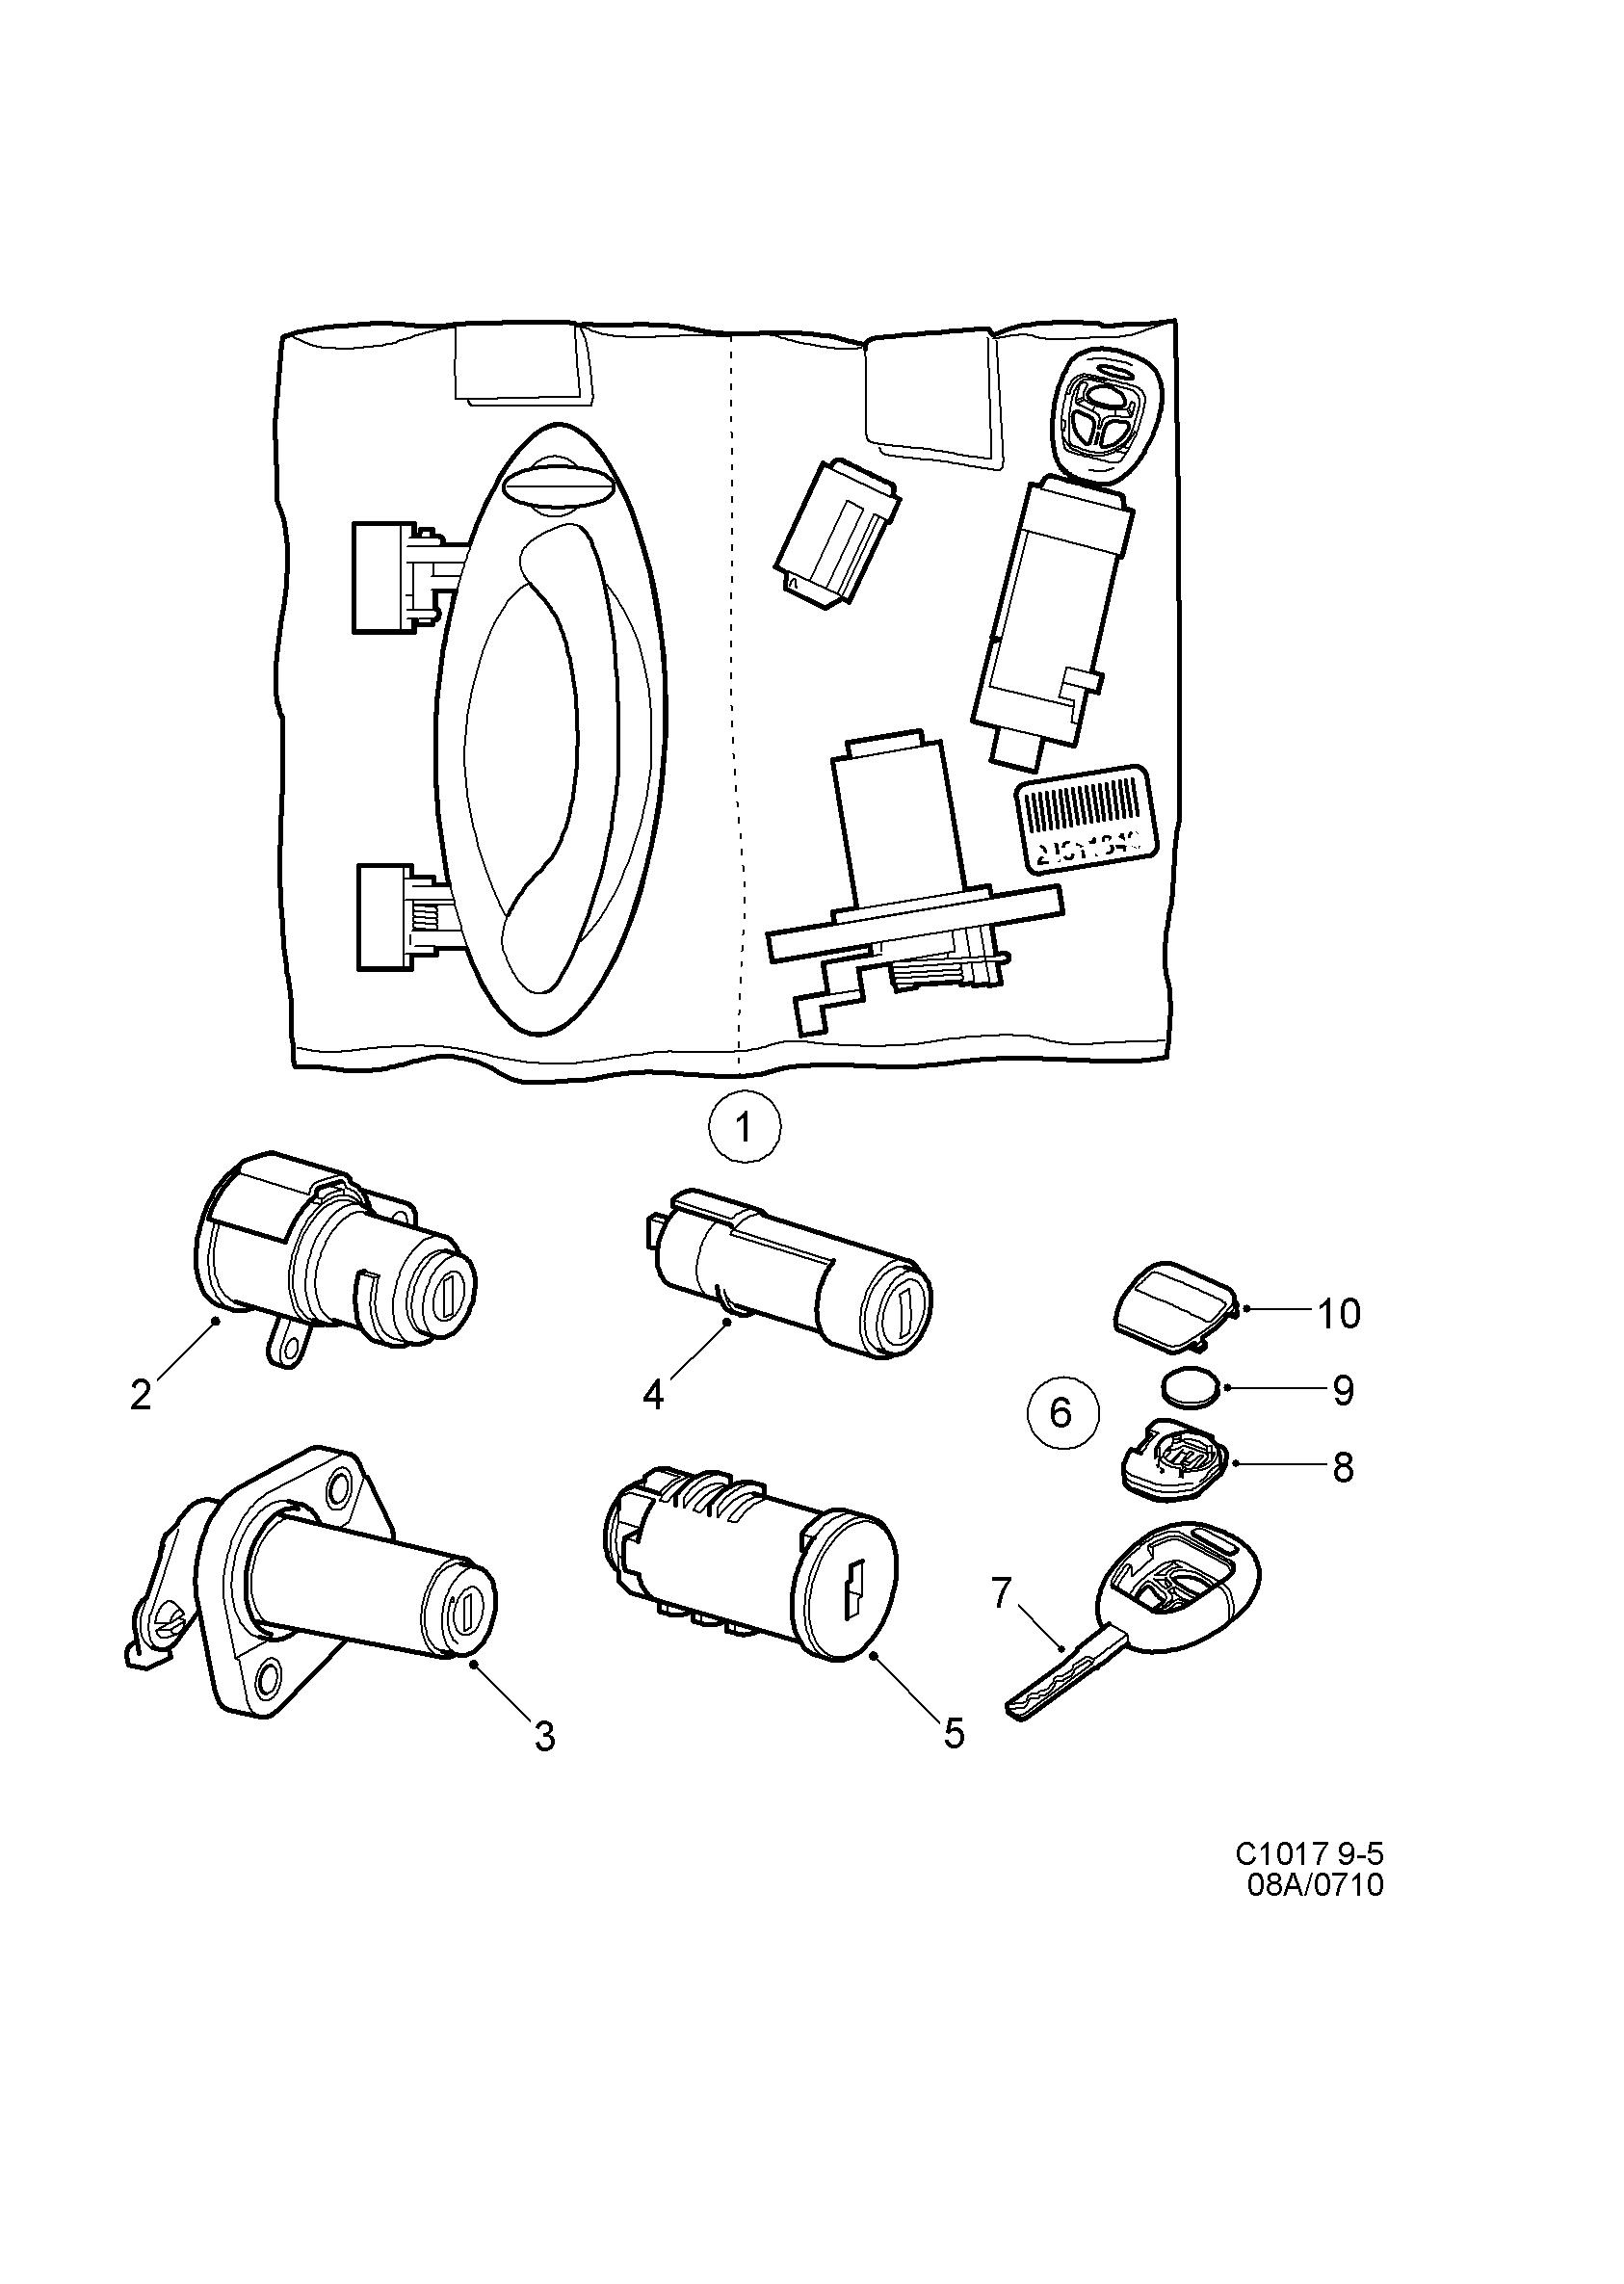 saab 9 5 9600 lock lock cylinder set 2001 2003 33026906 Saab 9-5 Interior lock lock cylinder set 2001 2003 33026906